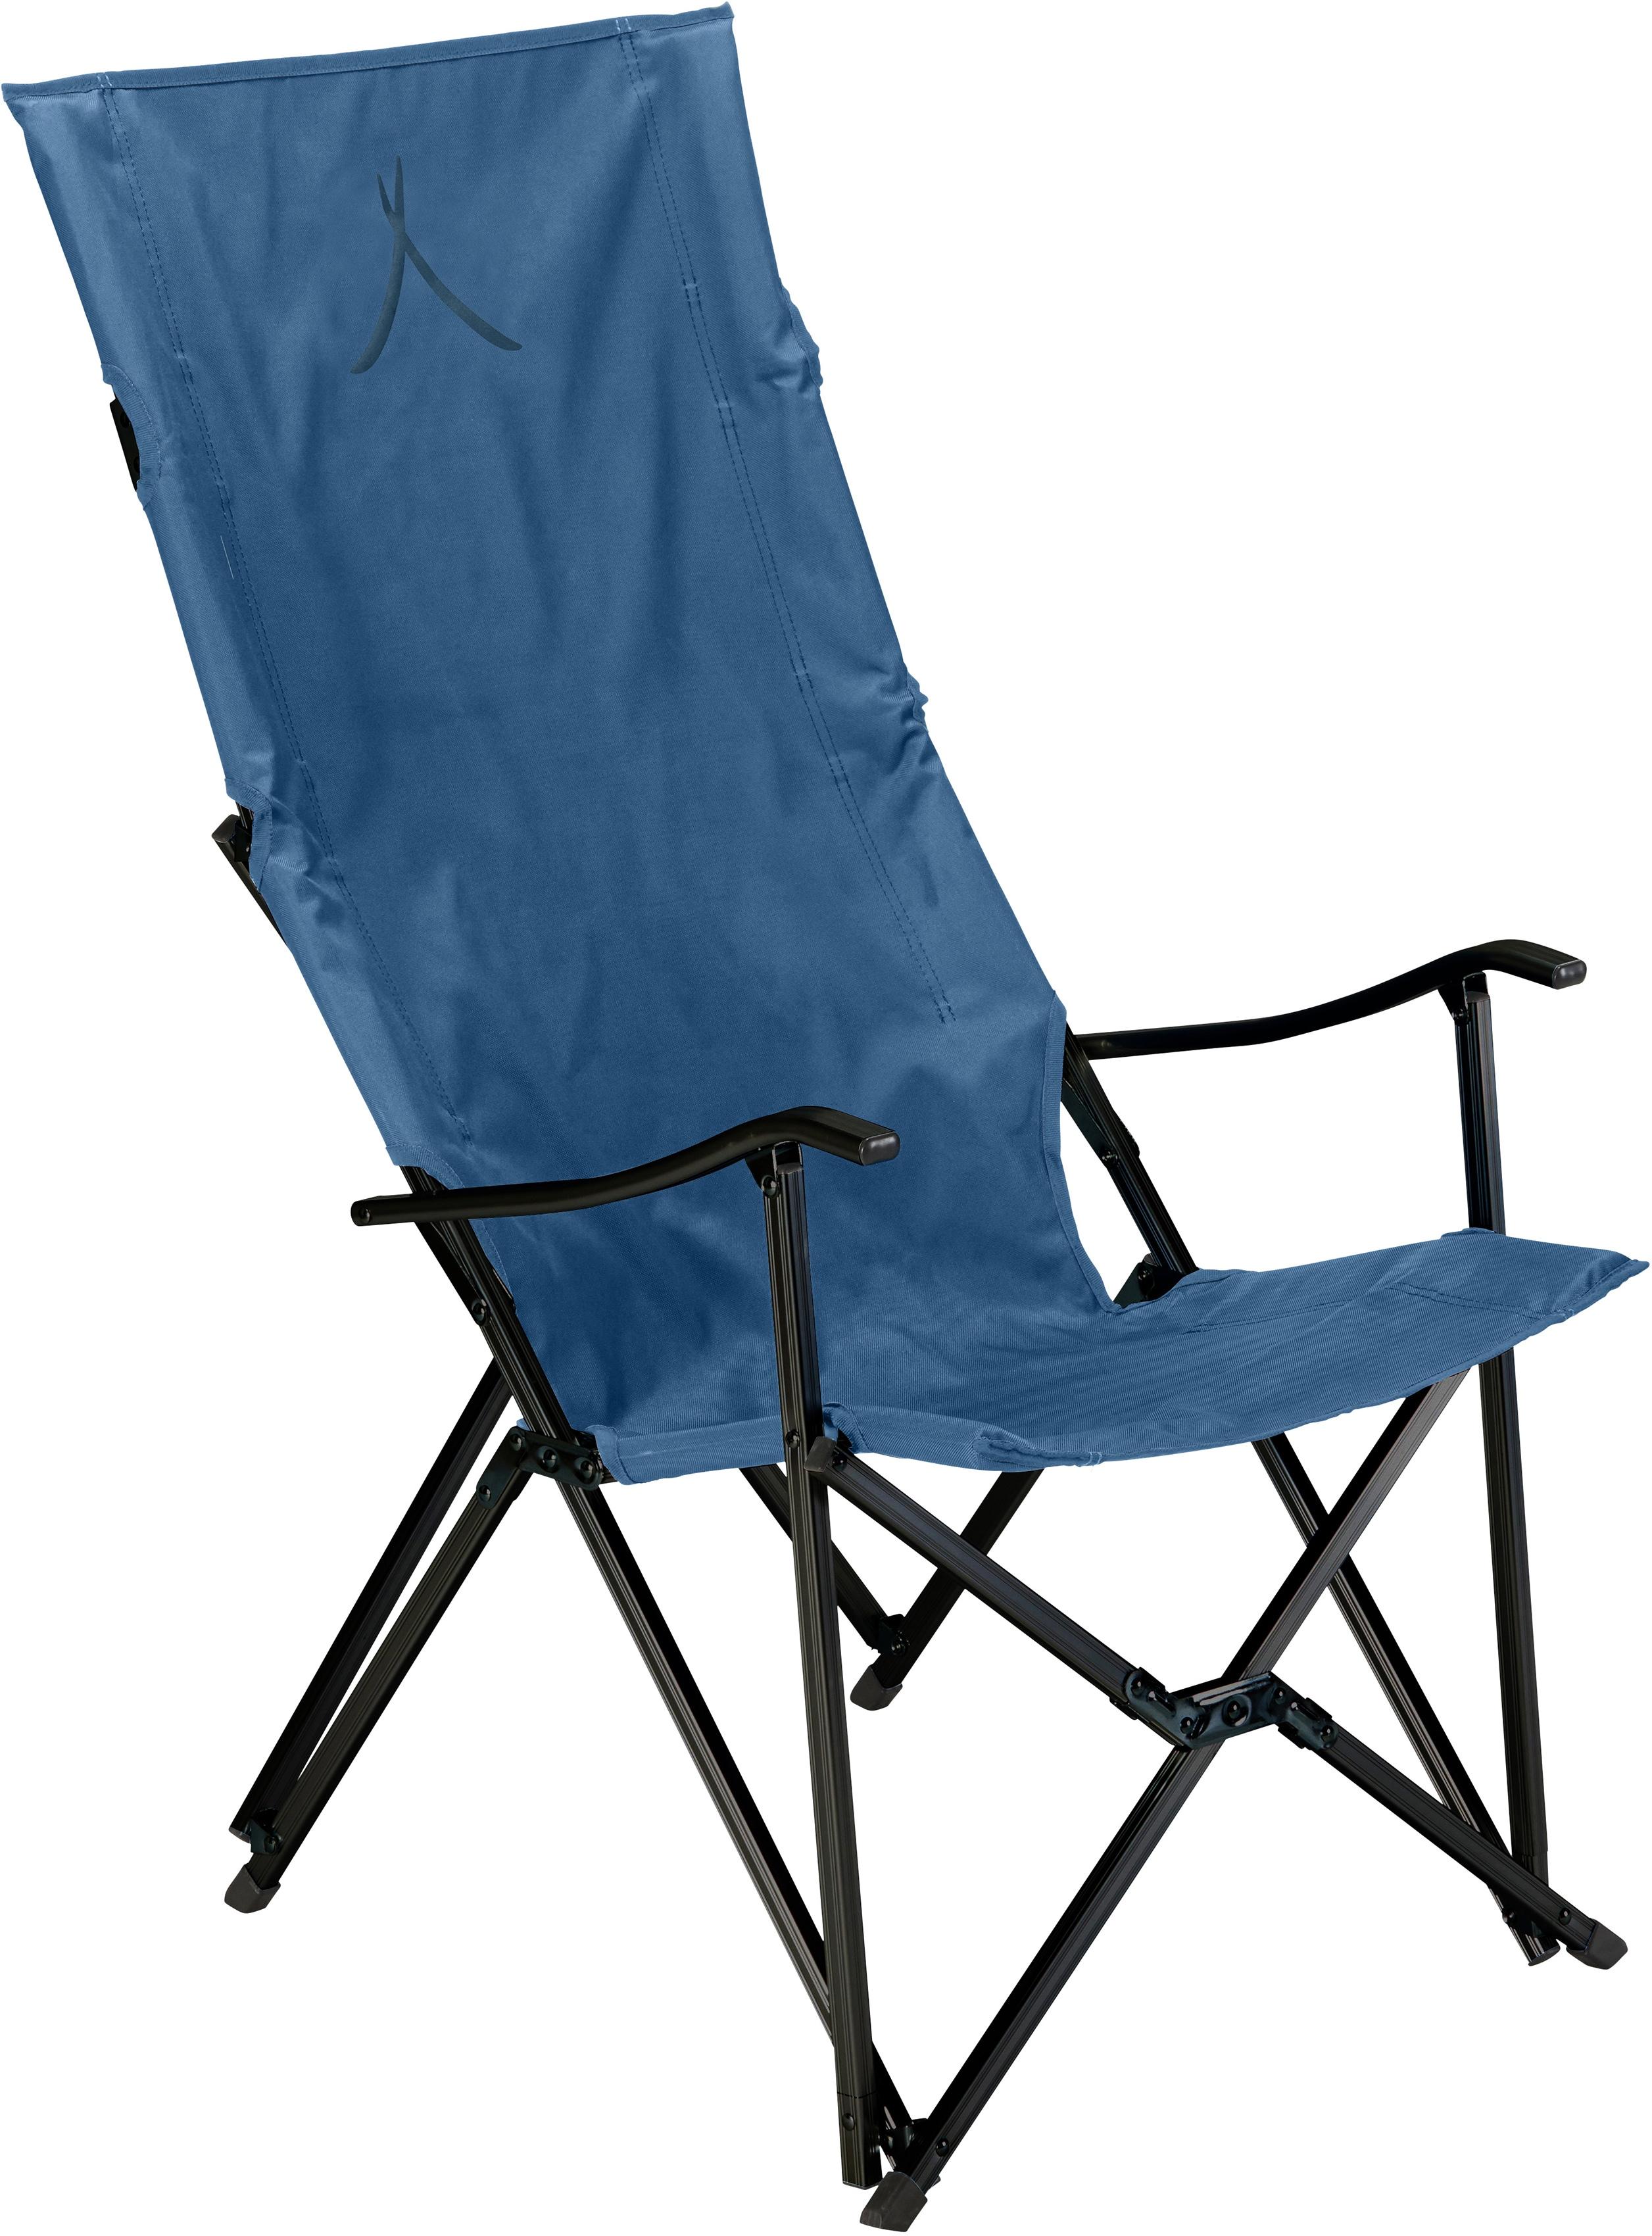 GRAND CANYON Campingstuhl EL TOVAR HIGHBACK blau Campingmöbel Camping Schlafen Outdoor